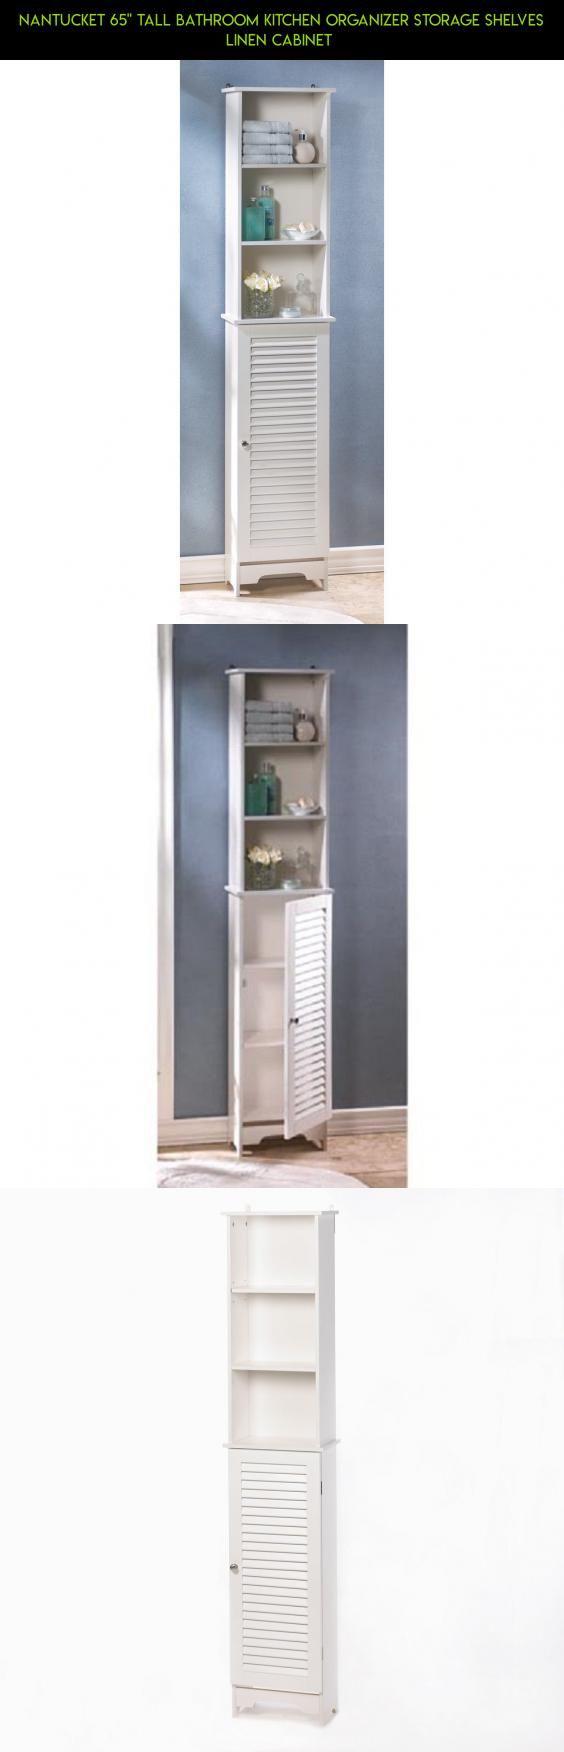 Tall bathroom storage cabinets - 25 Best Ideas About Tall Bathroom Cabinets On Pinterest Bathroom Cabinets Neutral Bath Ideas And Bathroom Linen Tower